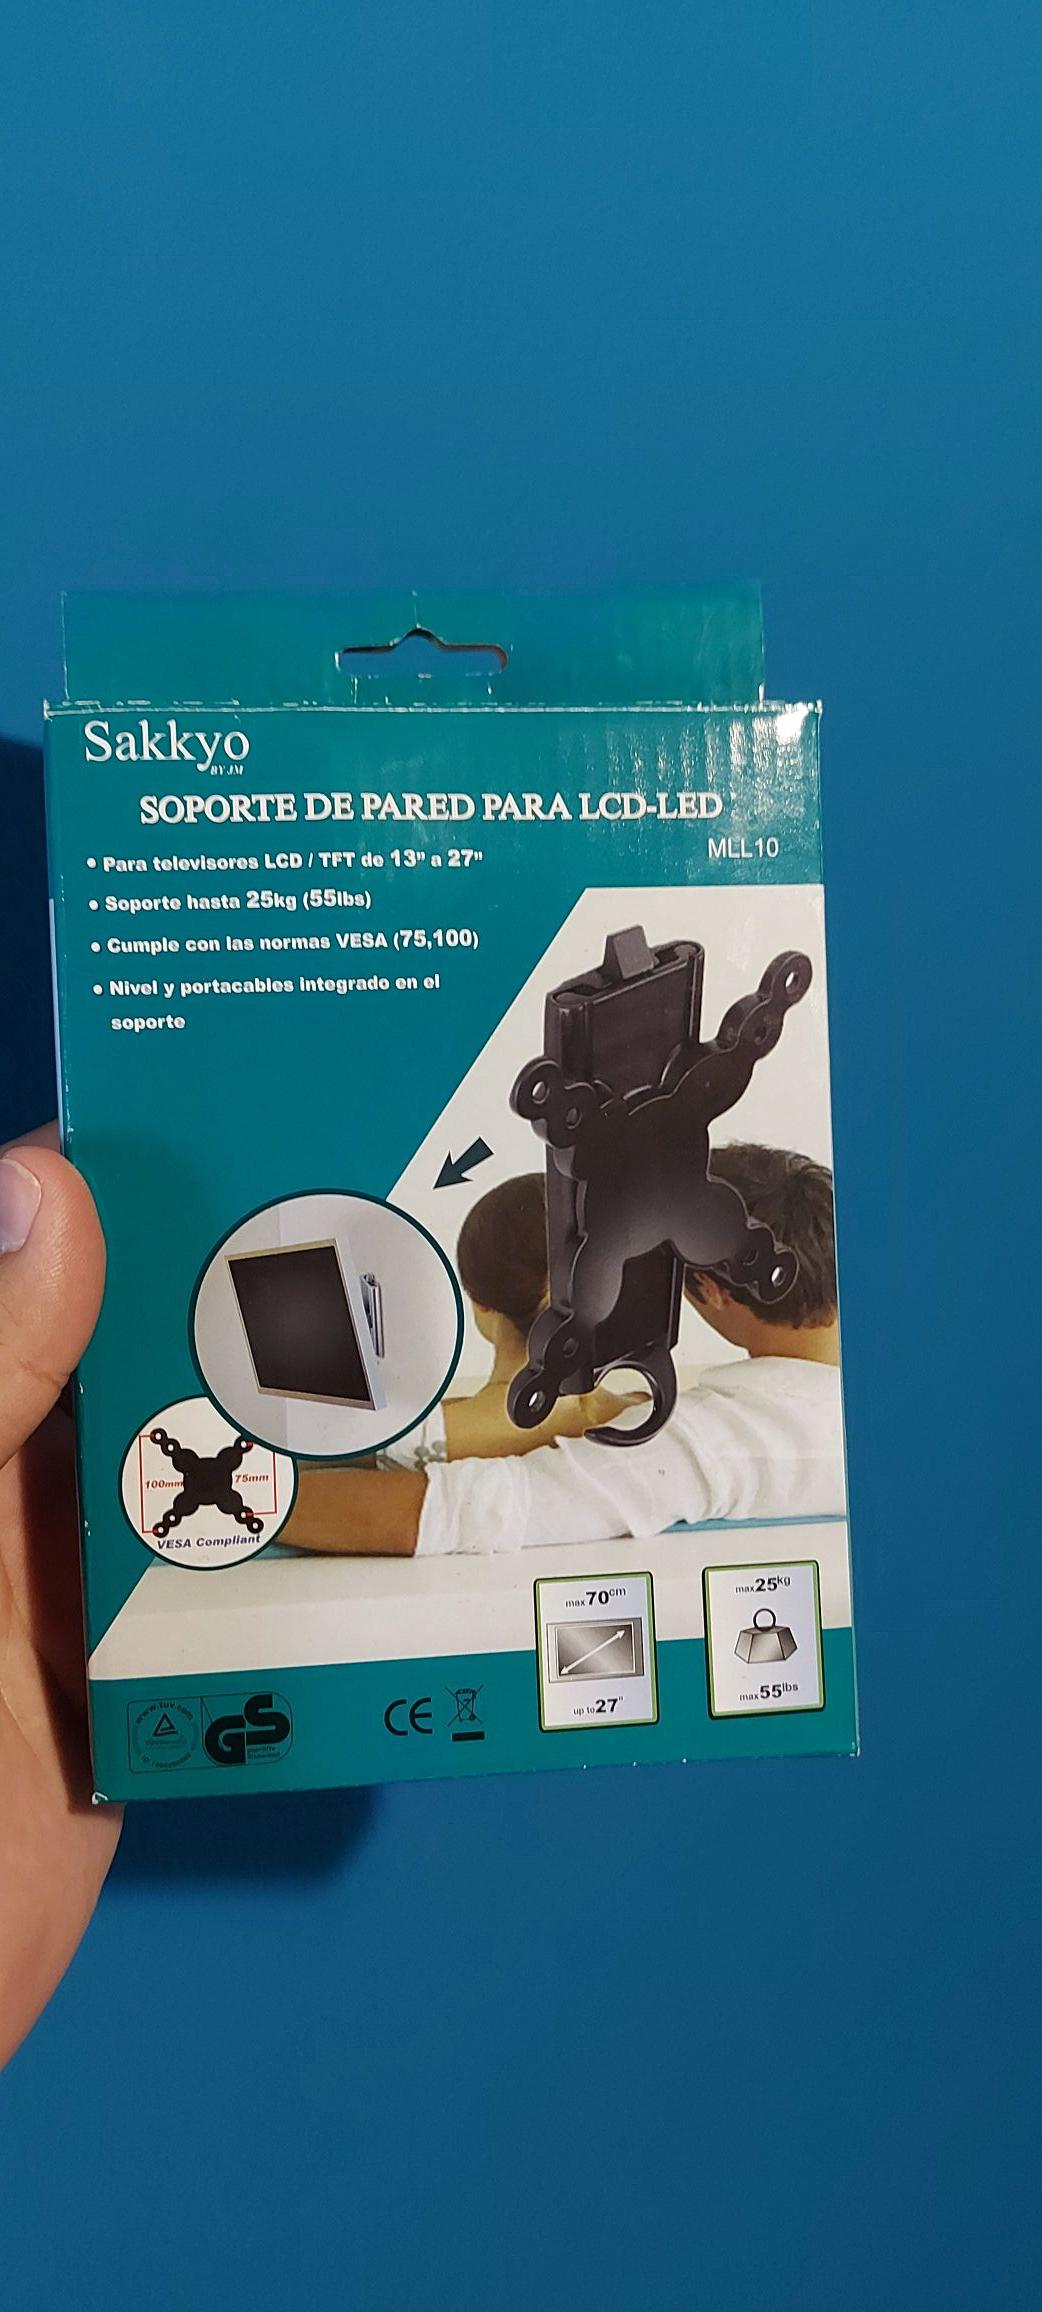 Soporte TV sakkyo(Canarias)